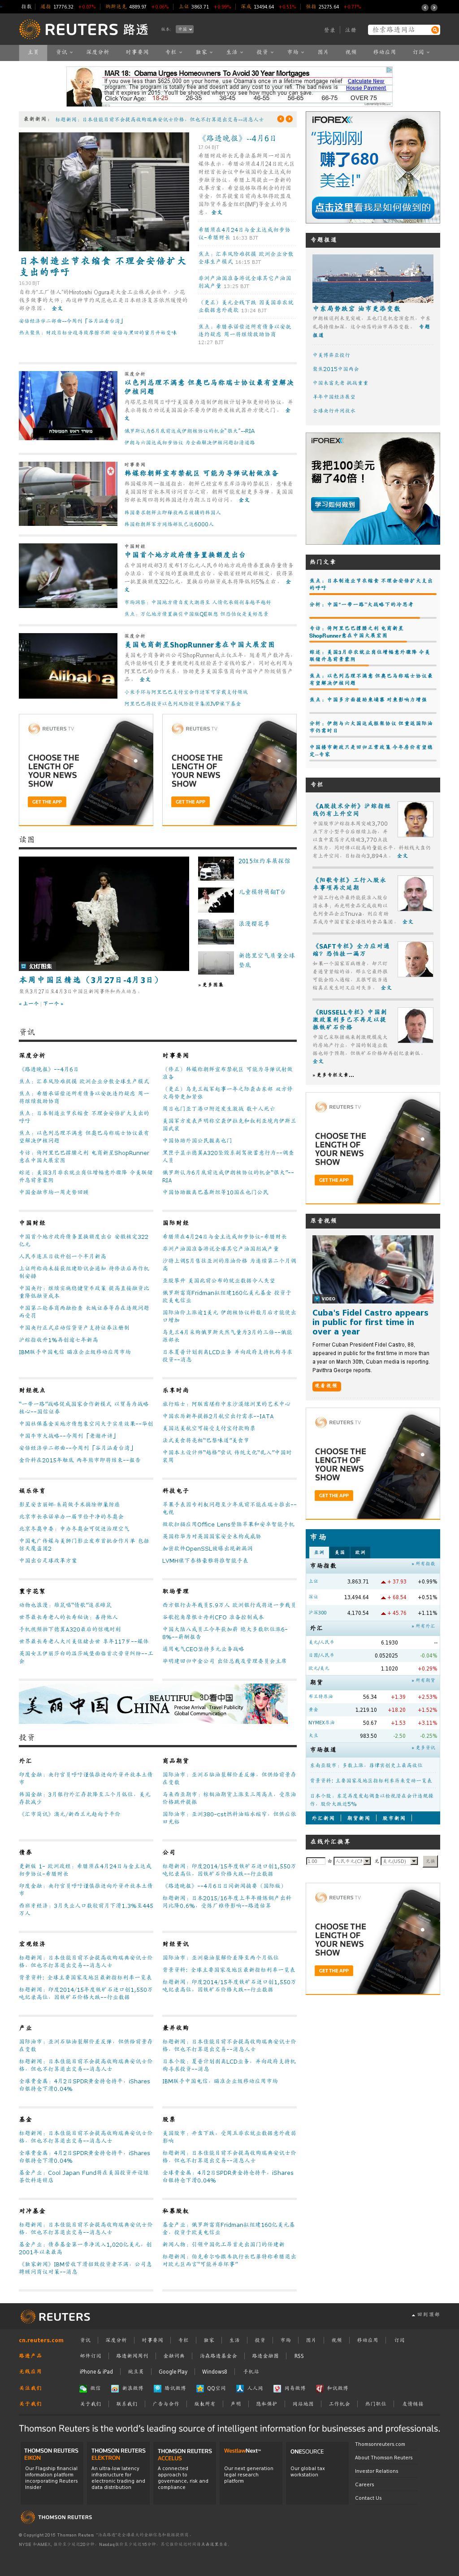 Reuters (Chinese) at Monday April 6, 2015, 2:18 p.m. UTC